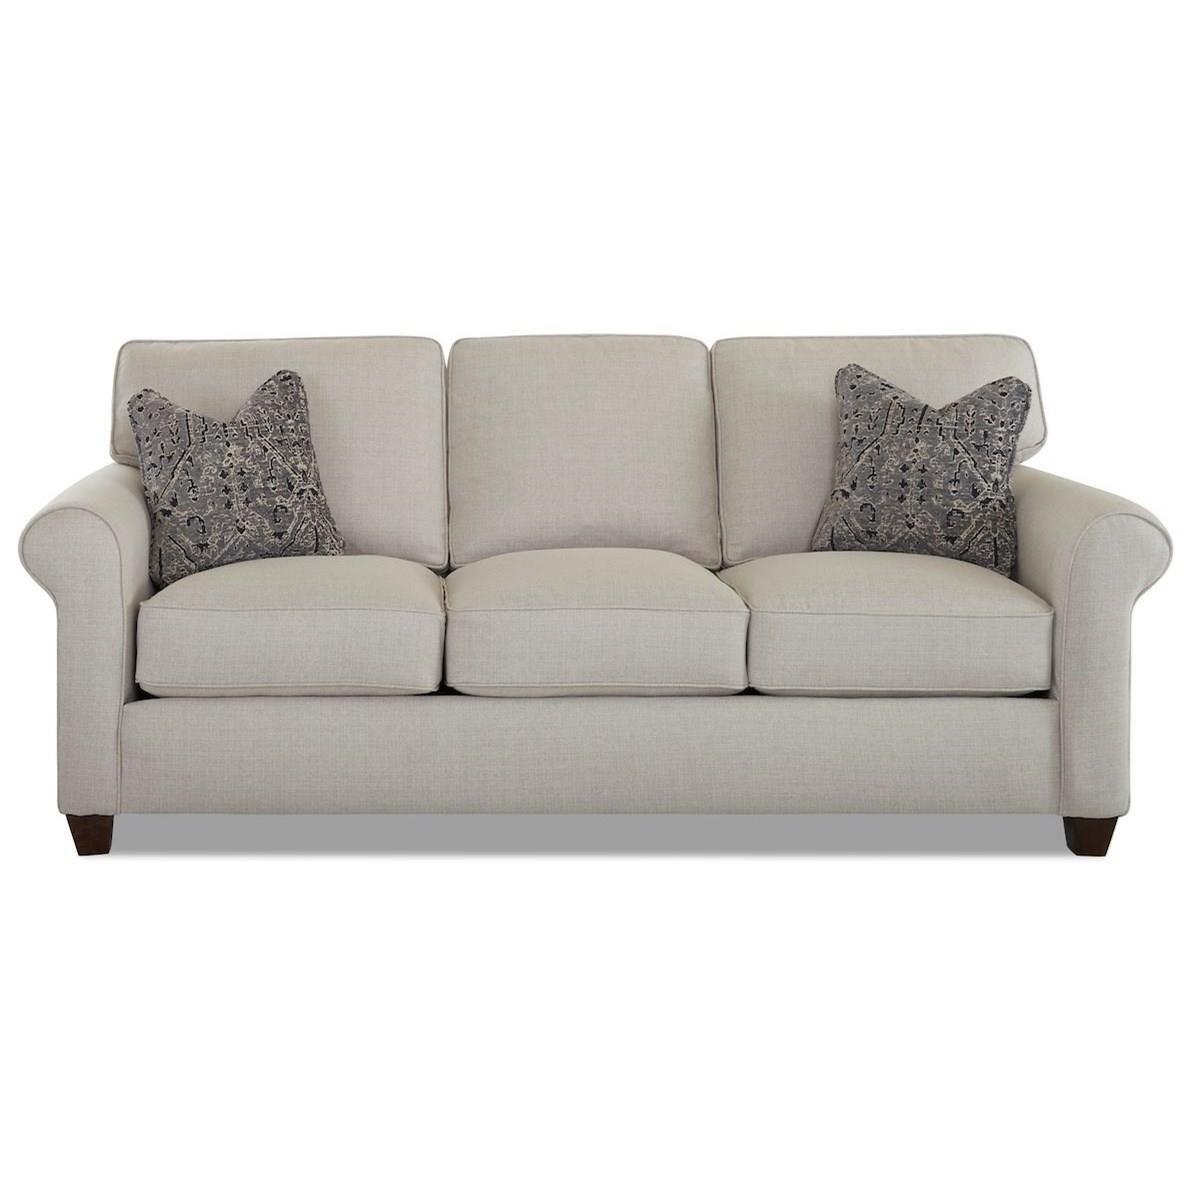 Transitional 90 Inch Sleeper Sofa with Air Dream Mattress